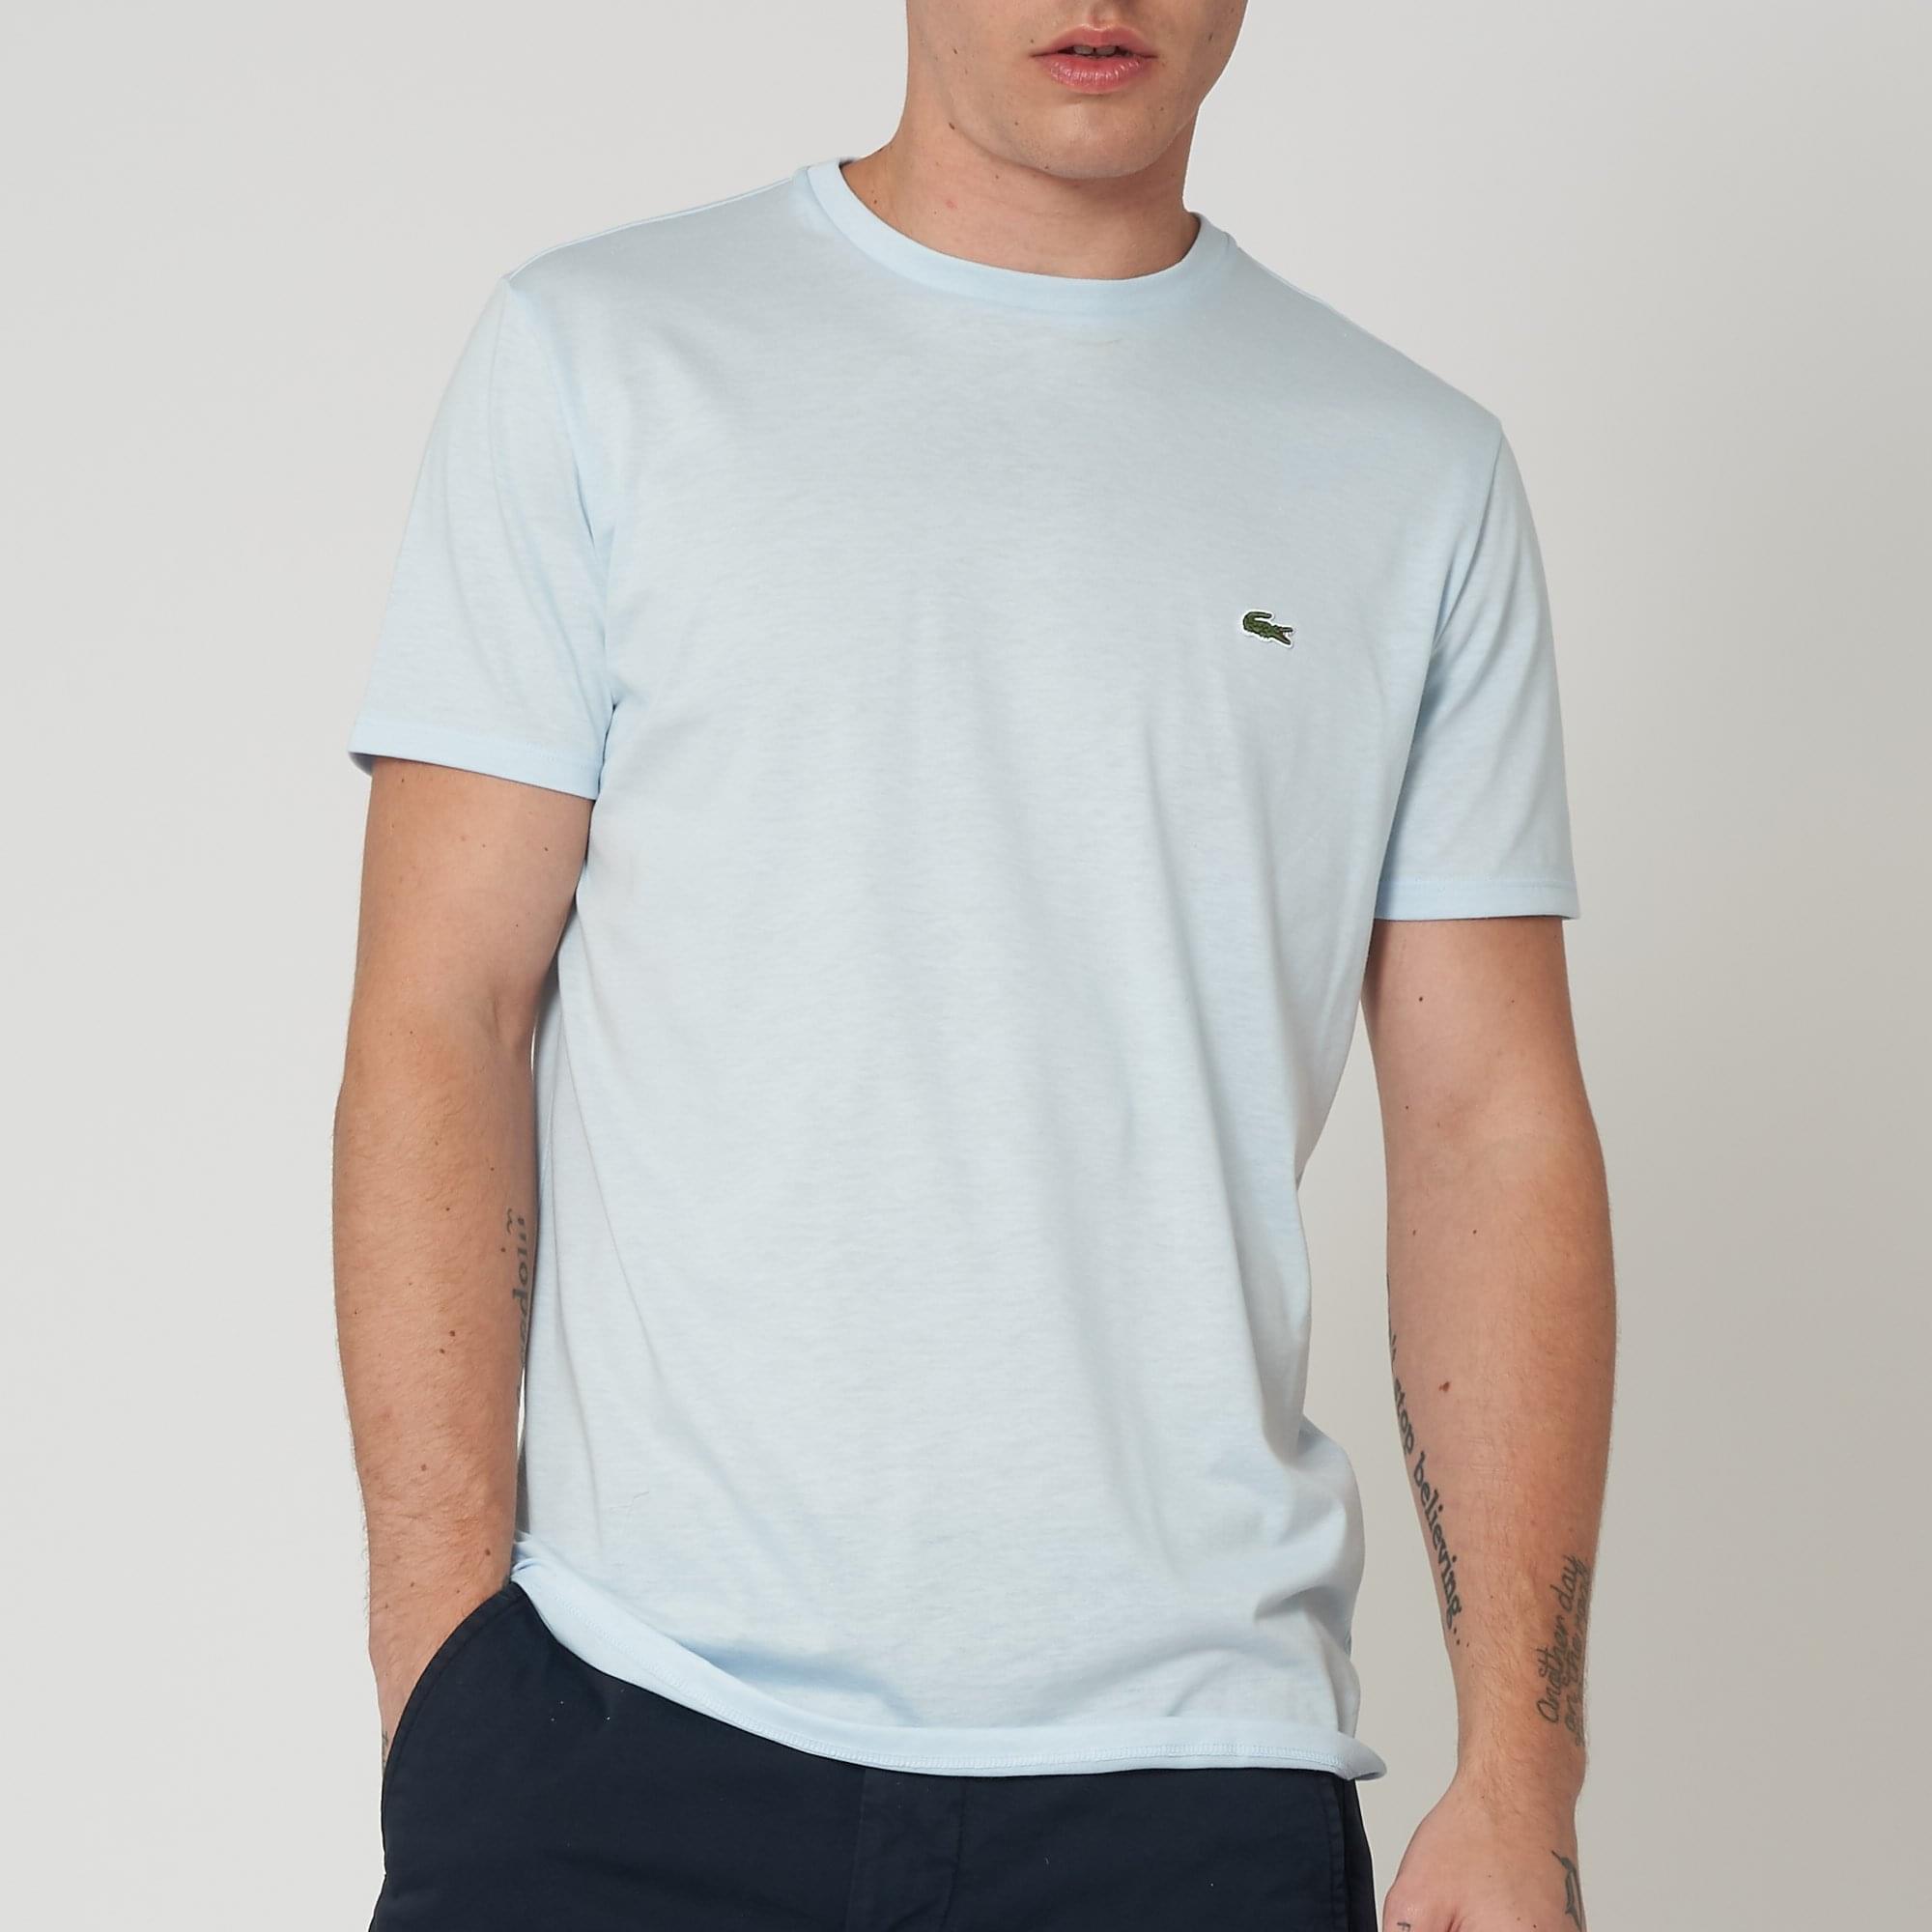 e124536fe52ba Lacoste Baby Blue Crew Neck Pima Cotton T-Shirt TH6709